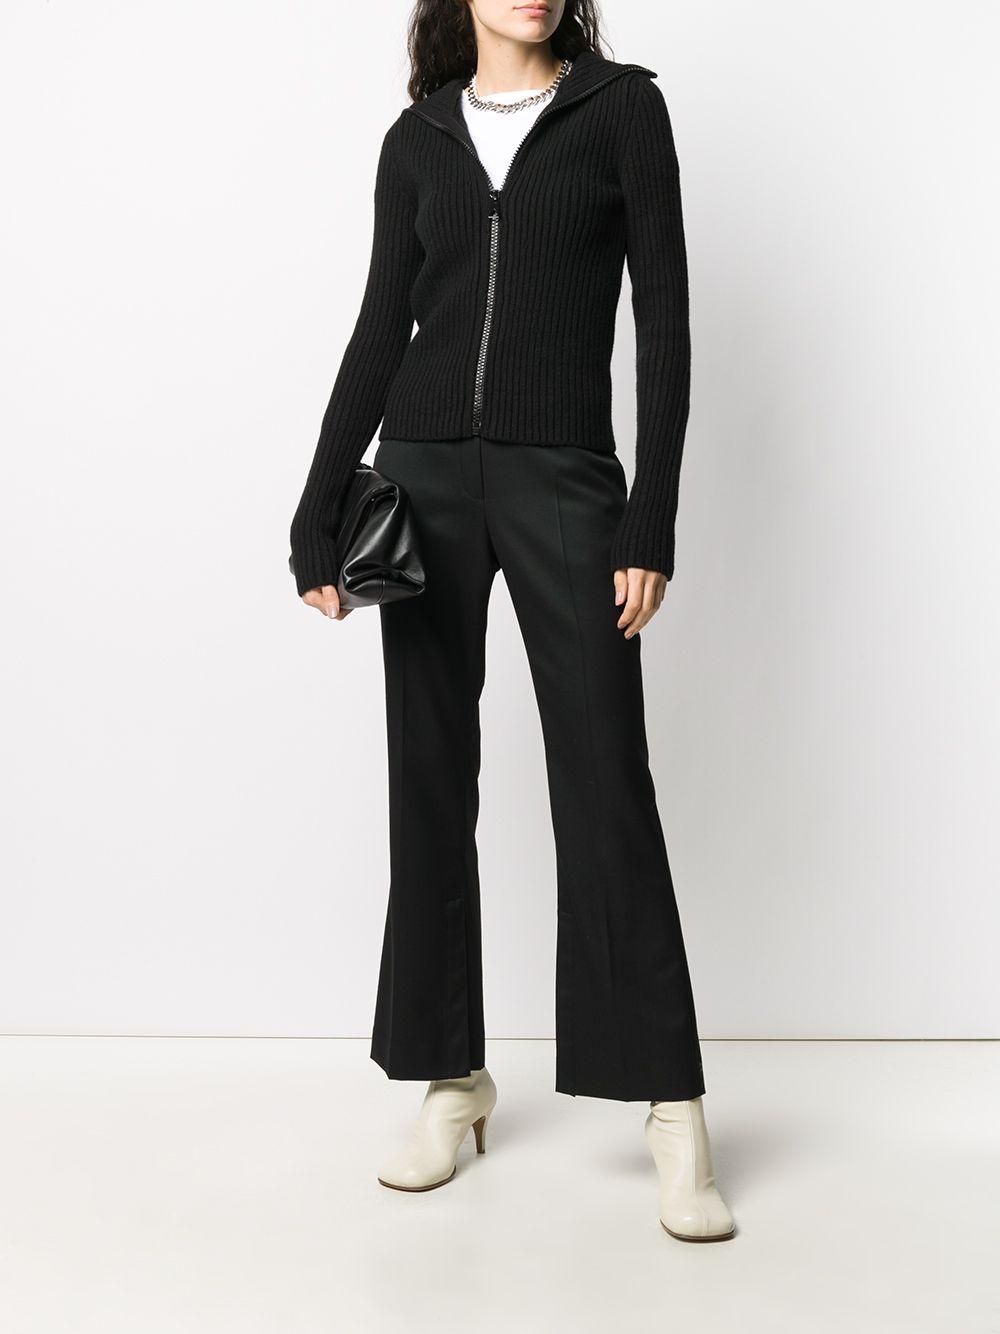 cardigan corto lana coste pesante collo montante zip davanti BOTTEGA VENETA | Cardigan | 640084-V07X01000